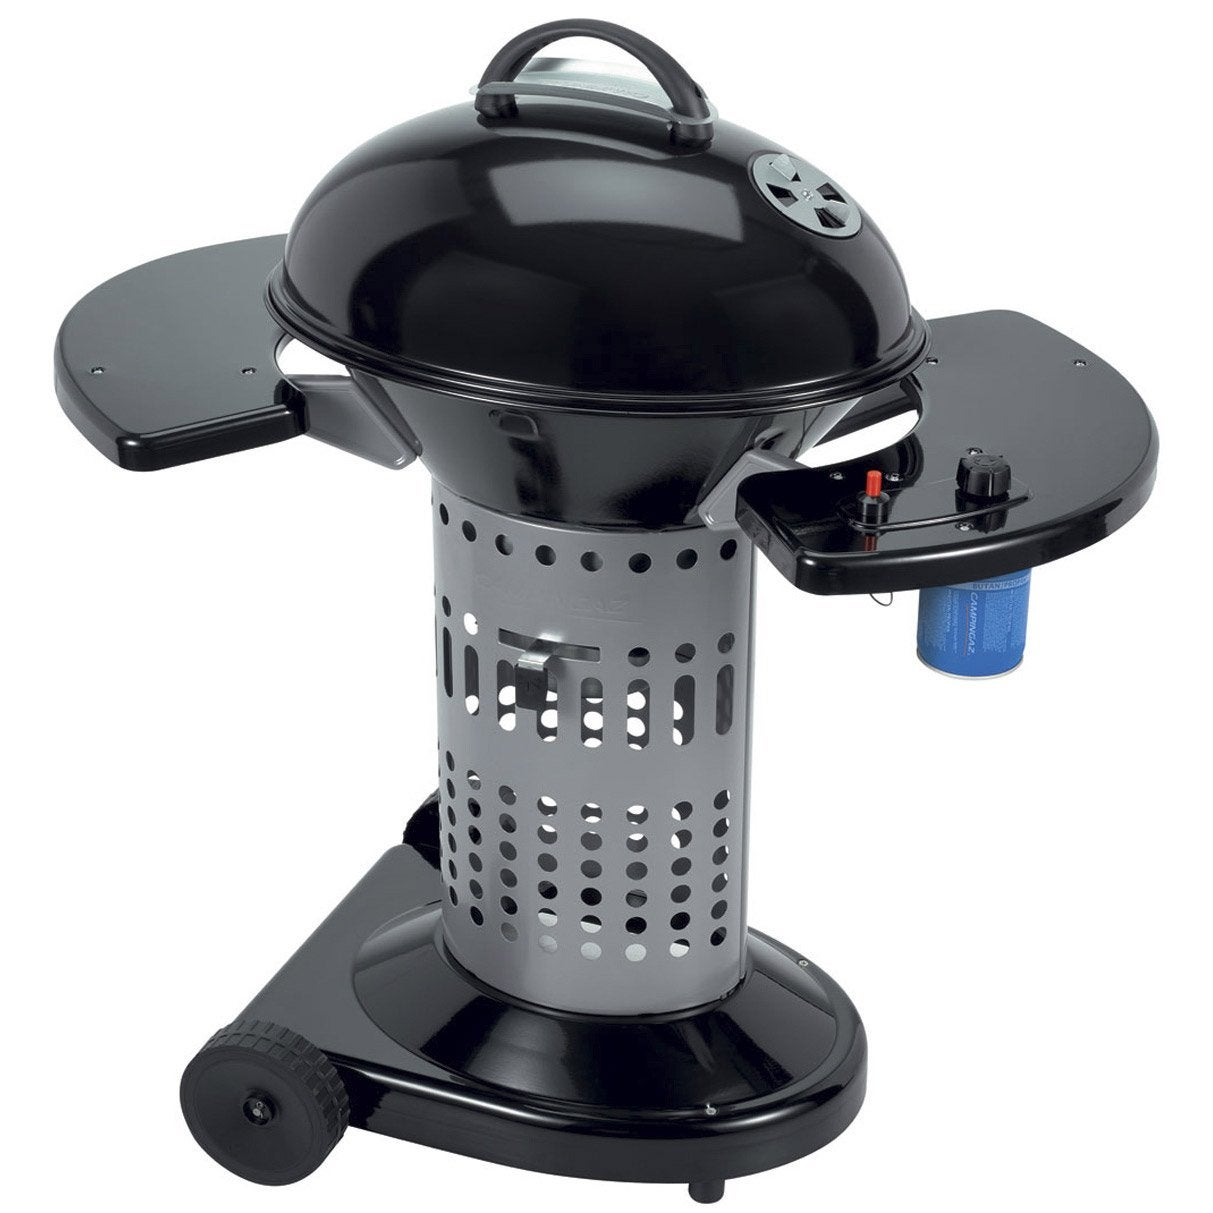 Barbecue au charbon de bois campingaz bonesco leroy merlin - Barbecue camping gaz leroy merlin ...